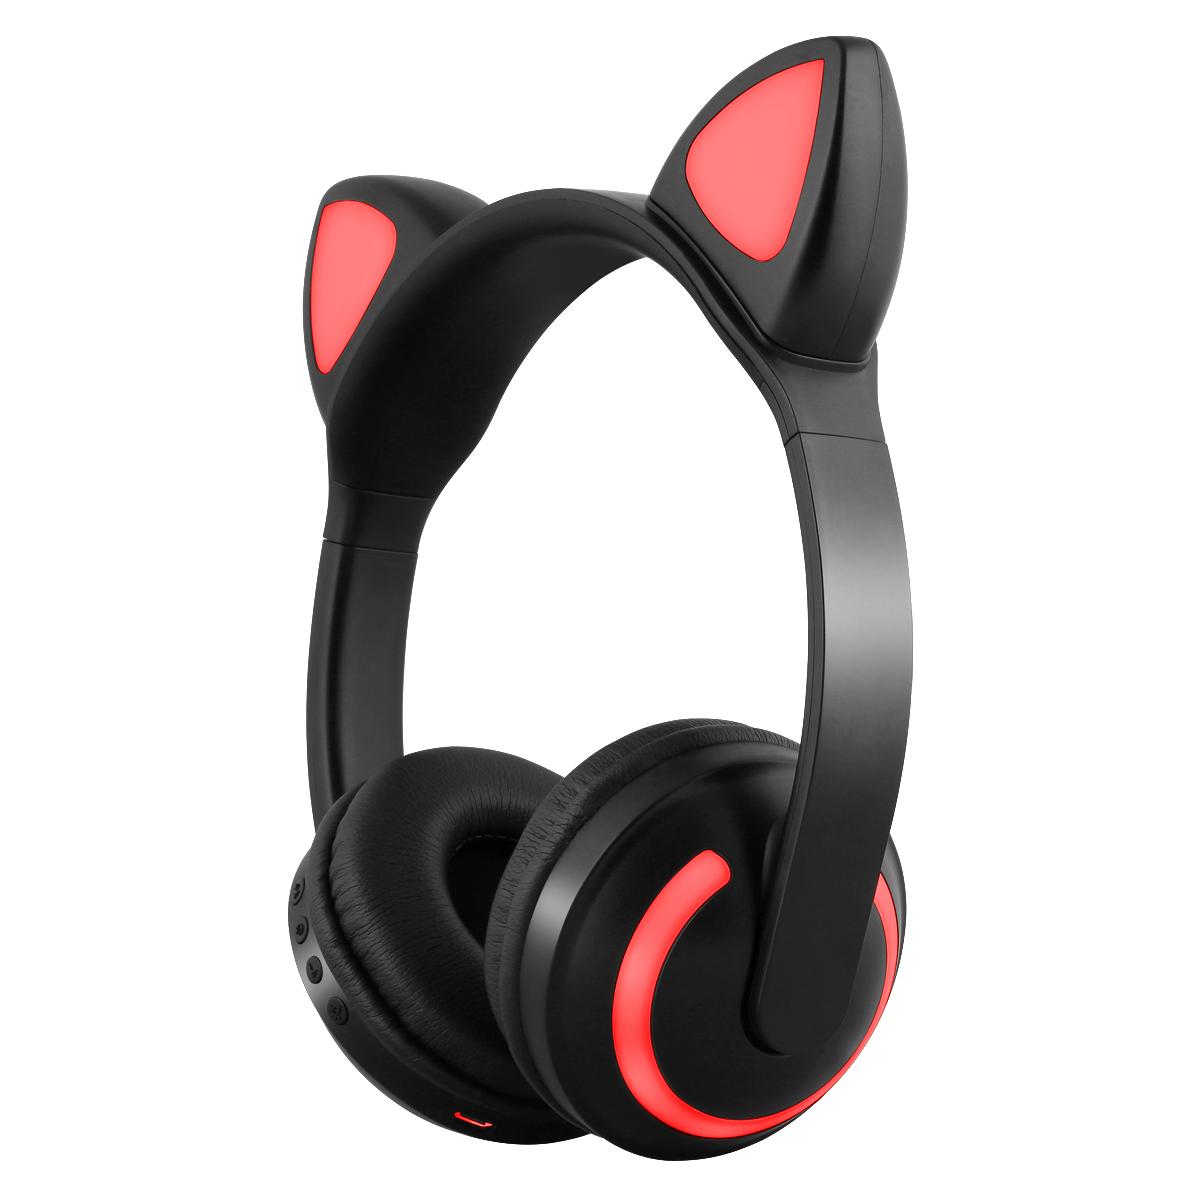 Wireless Bluetooth Stereo Cute Animal Ear Design Headphones Flashing Glowing Gaming Headset cat ear